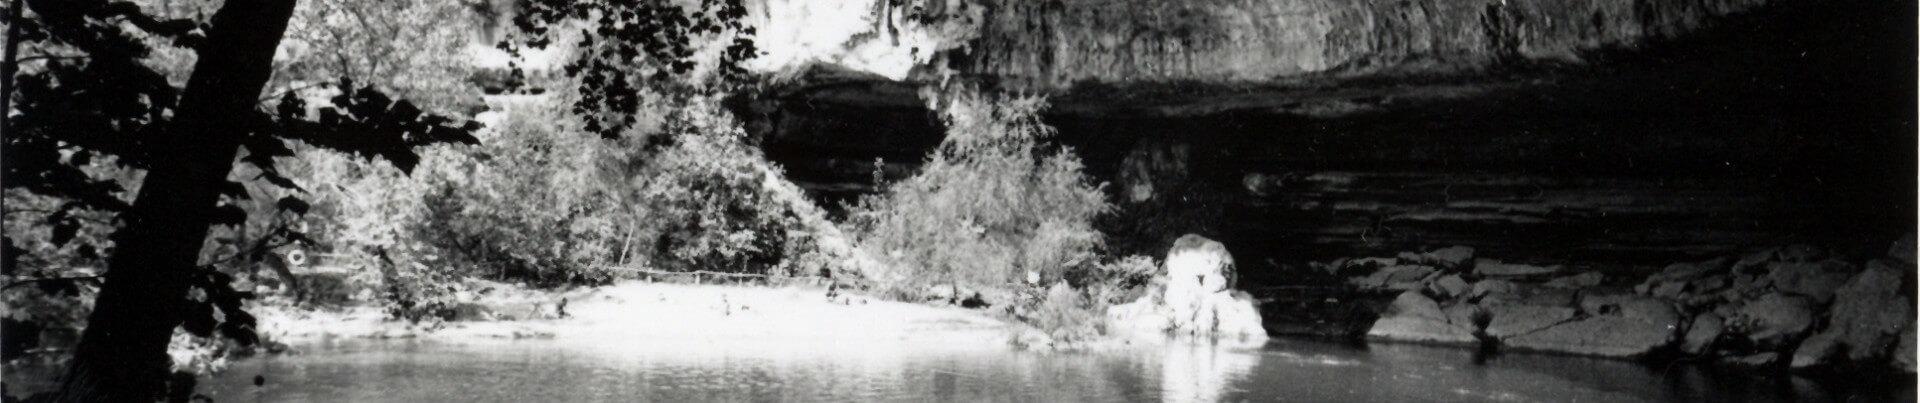 Hamilton Pool 1980s